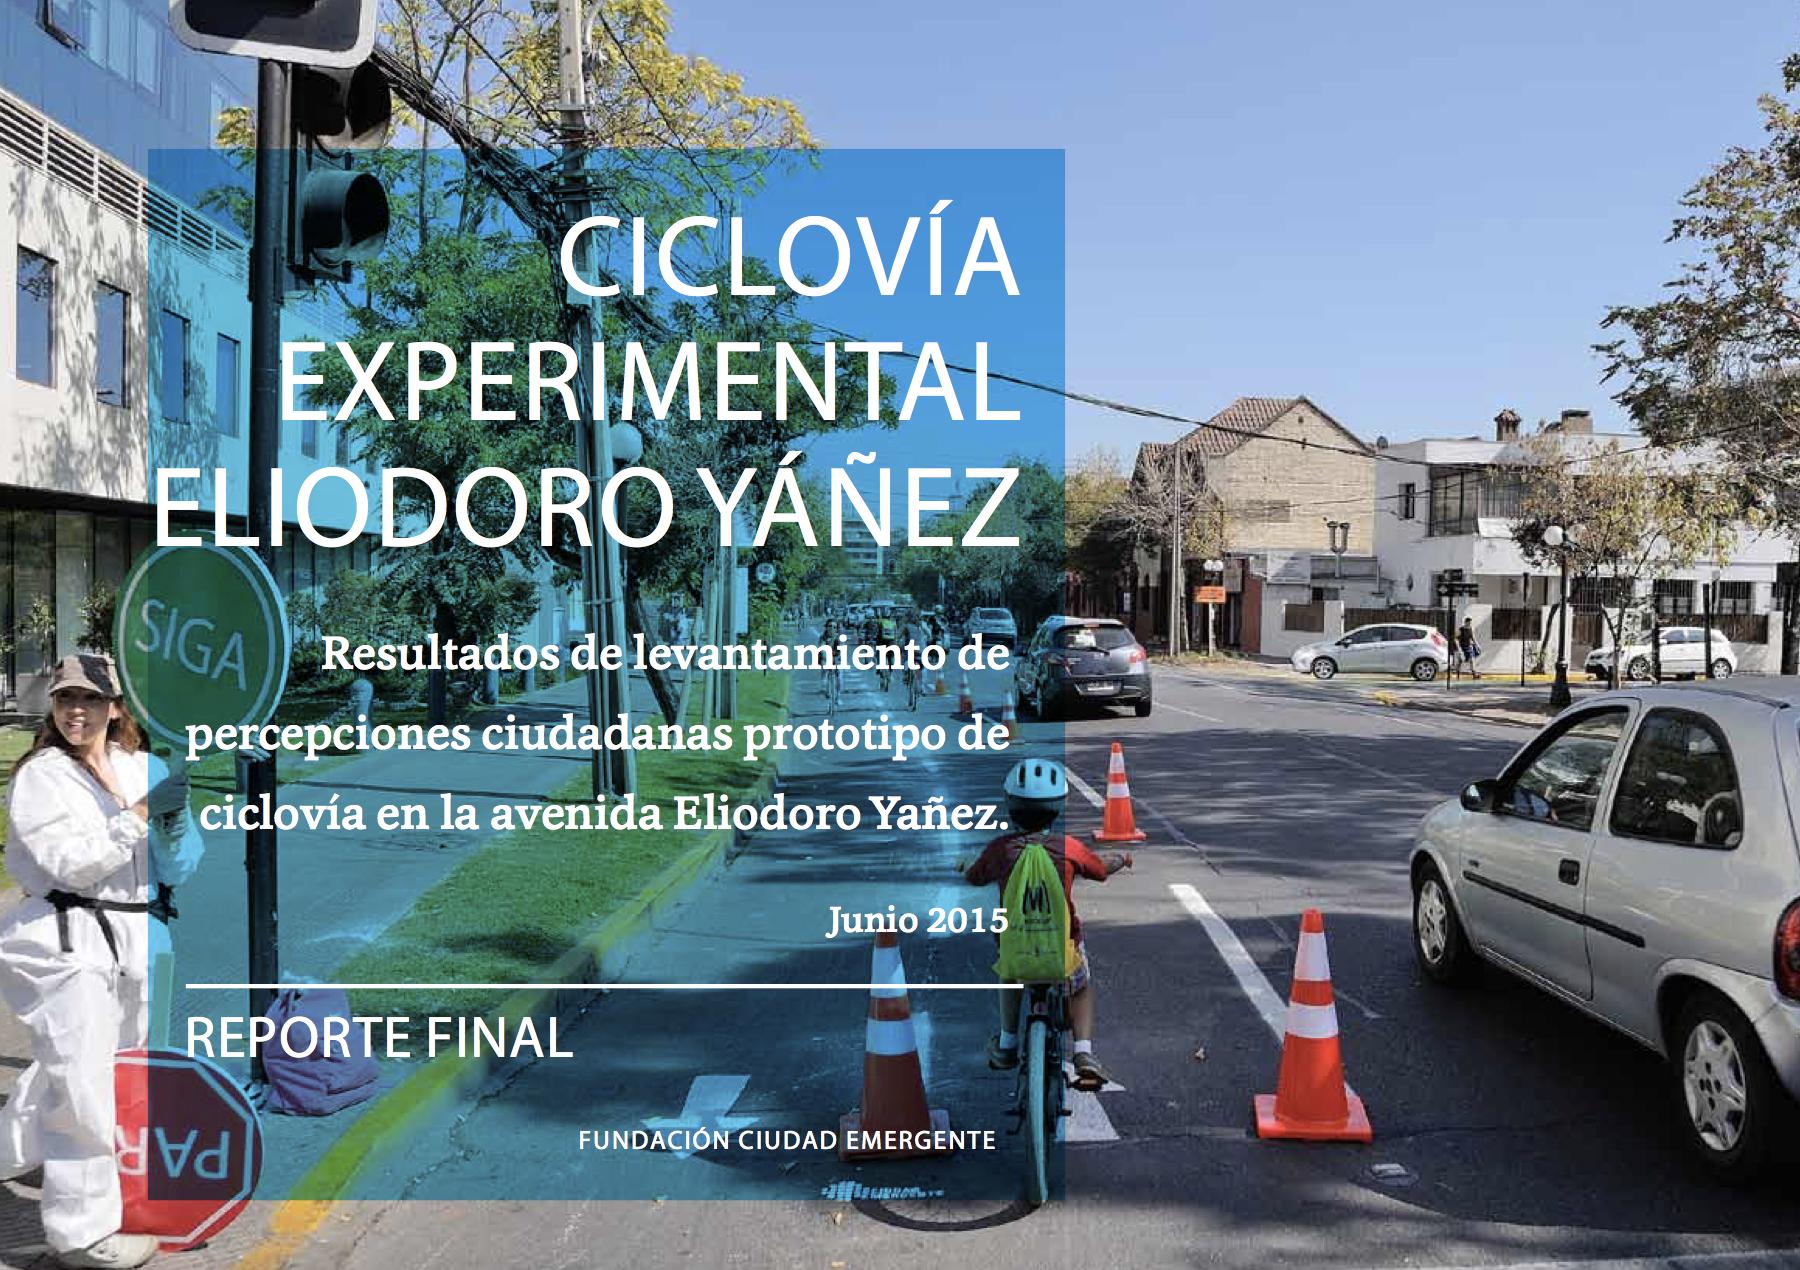 CICLOVIA EXPERIMENTAL ELIODORO YAÑEZ.png